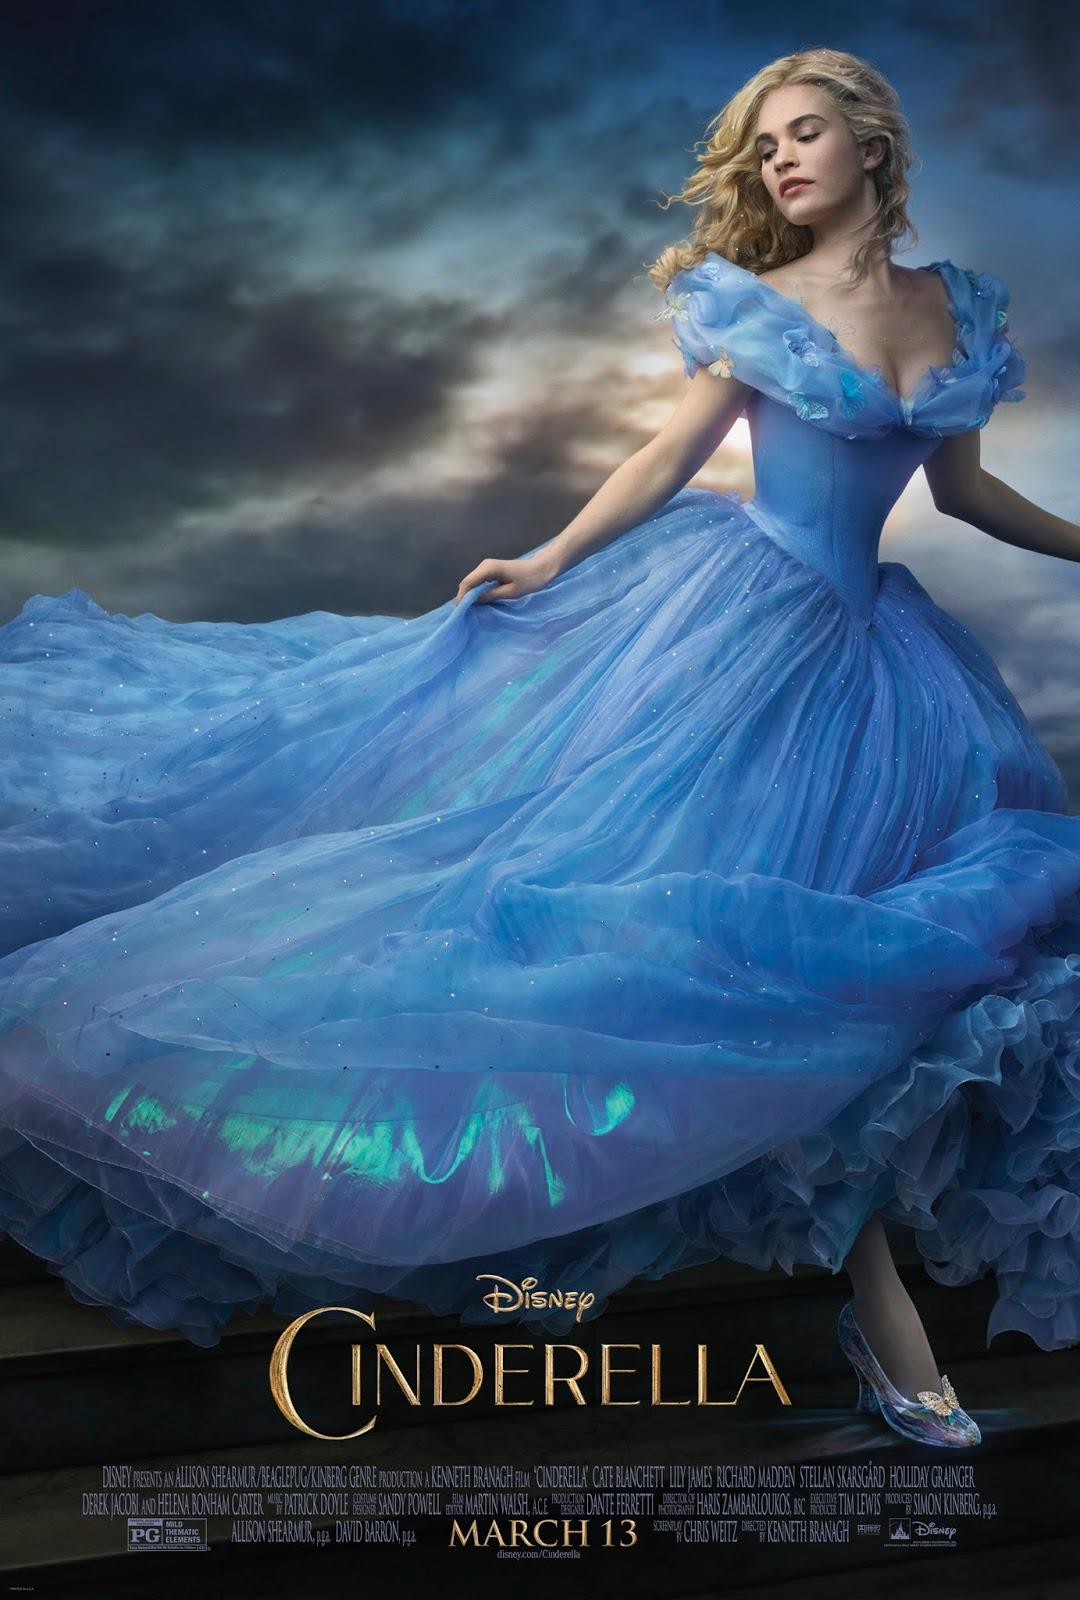 Cinderella Plakat Poster